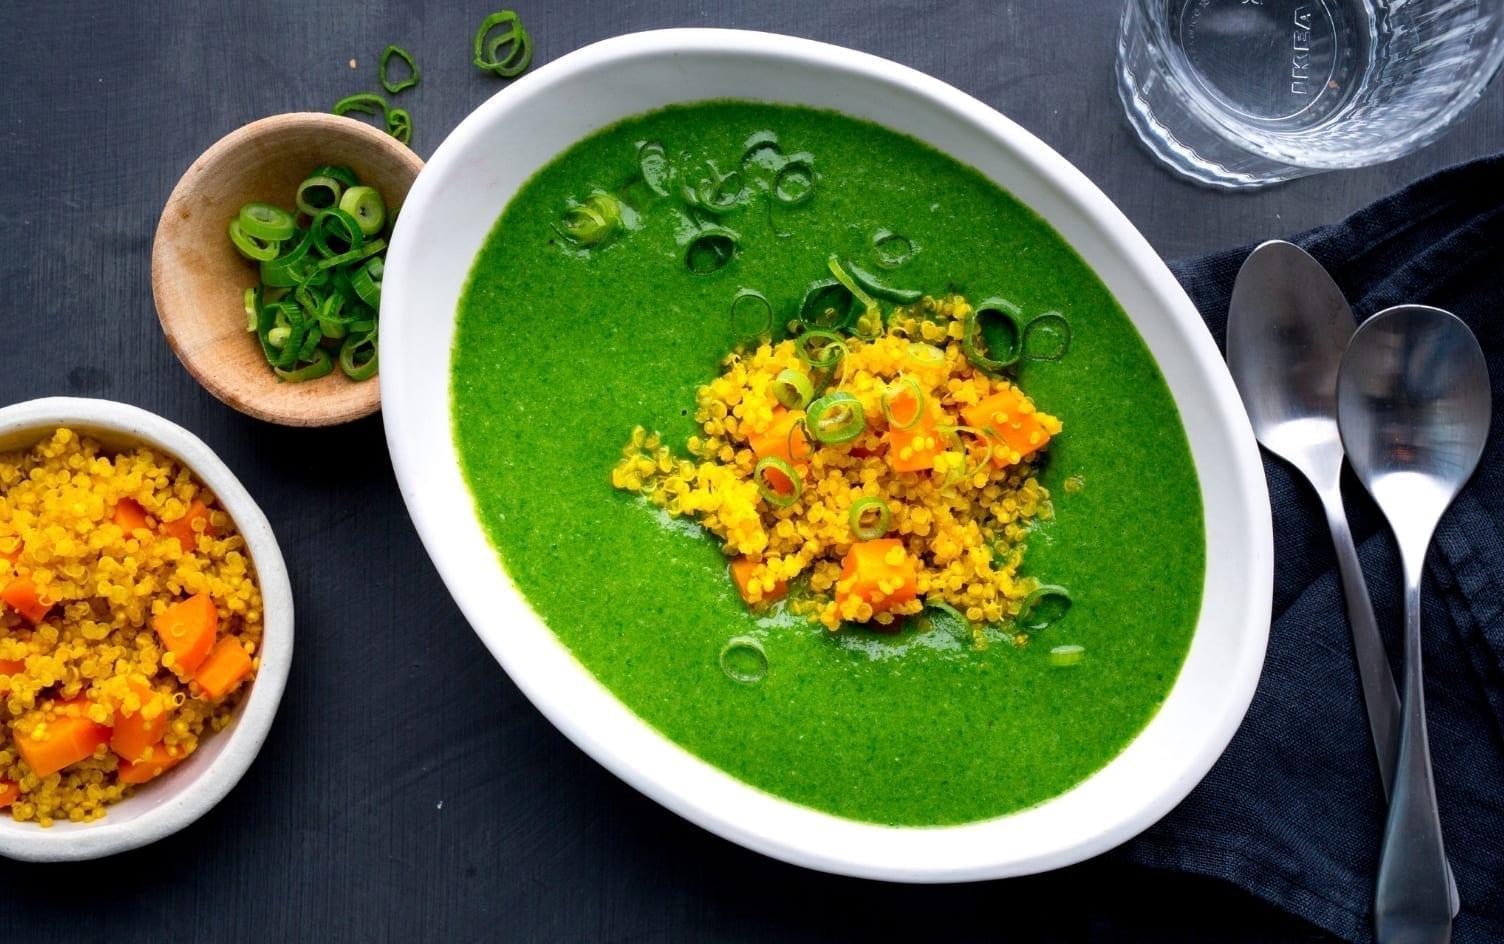 Creamy Spinach Soup With Golden Quinoa